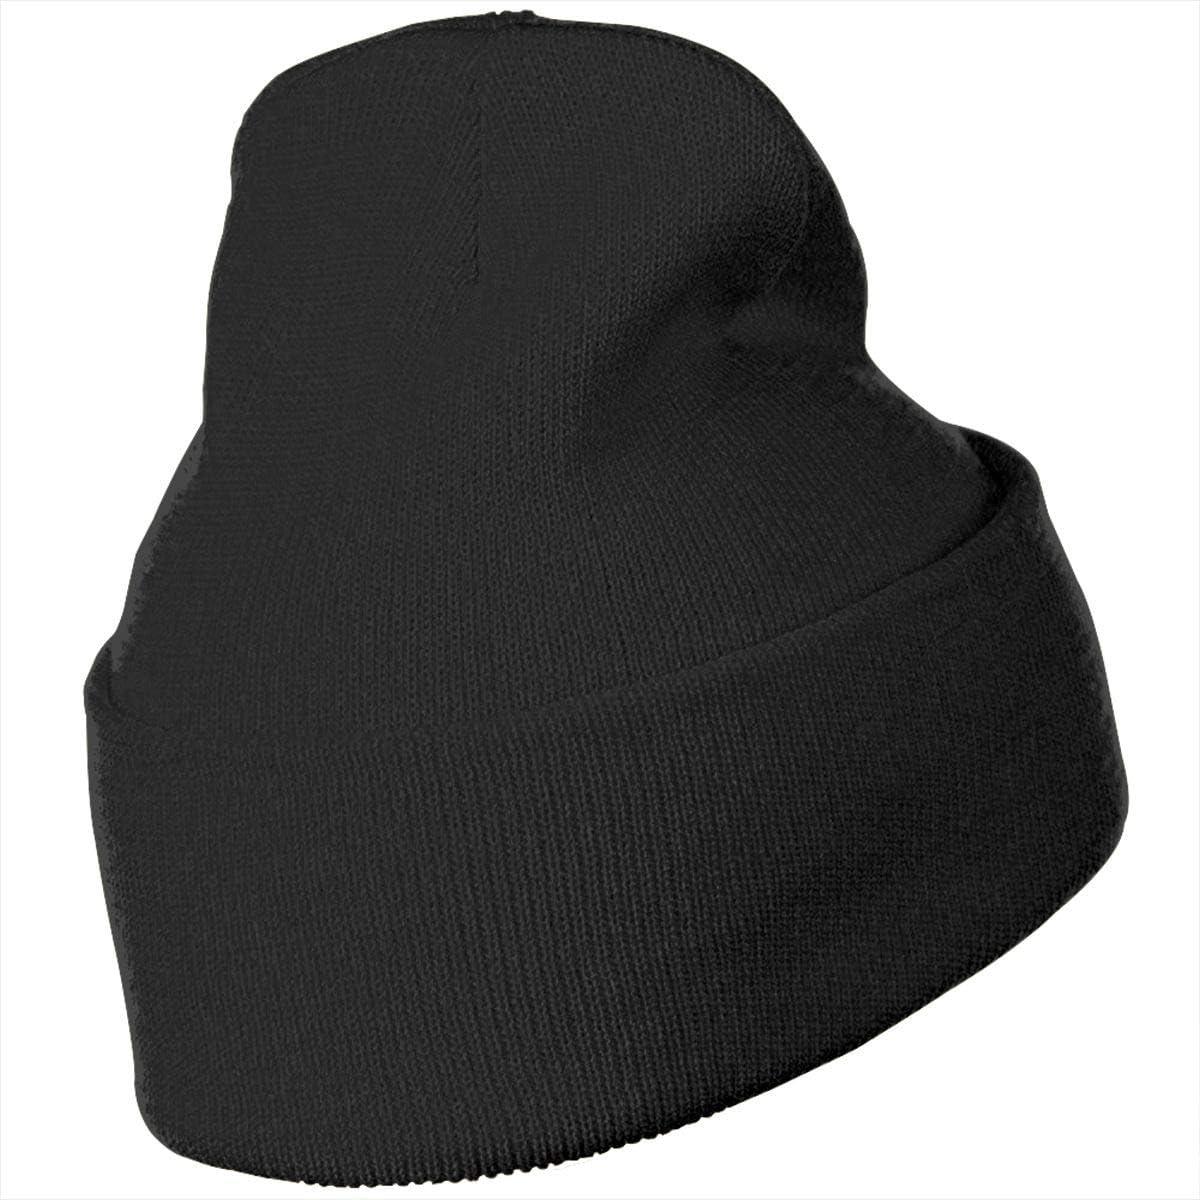 Peng Peng Marine Corps Bulldog USMC Logo Beanie Cap Skull Cap Men Women Winter Warm Knitting Hats